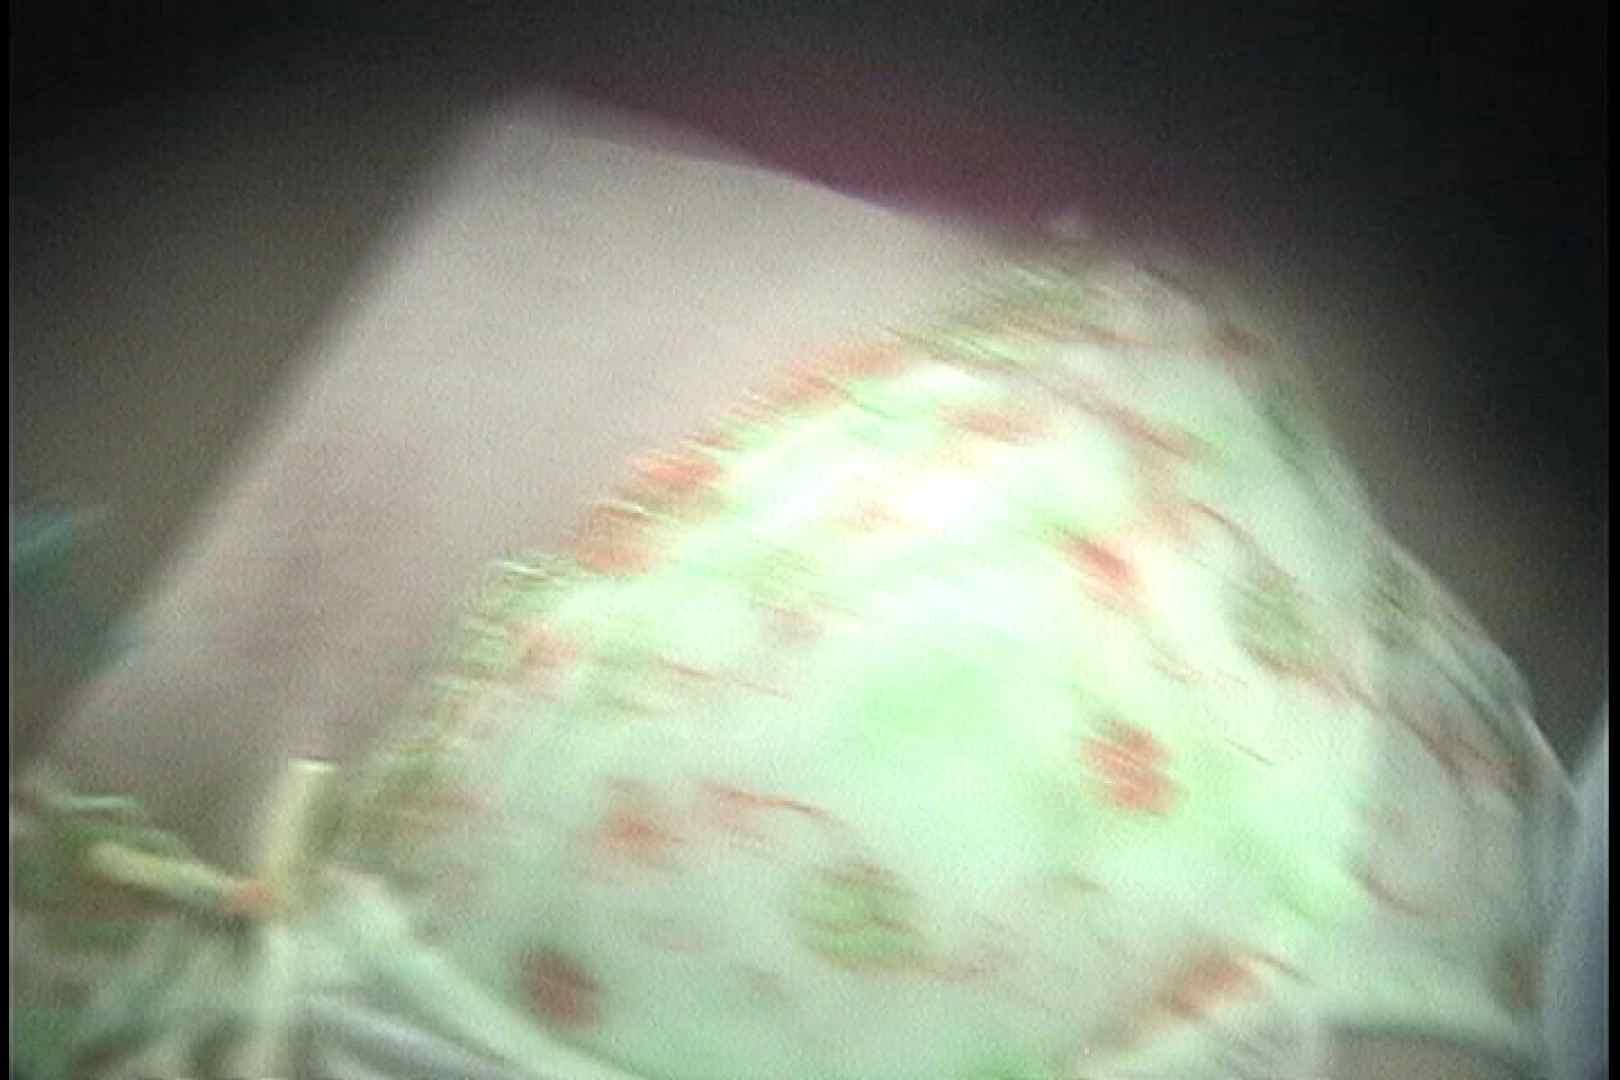 No.24 ビキニの割には陰毛は獰猛、ハミ毛が心配 0  104連発 100